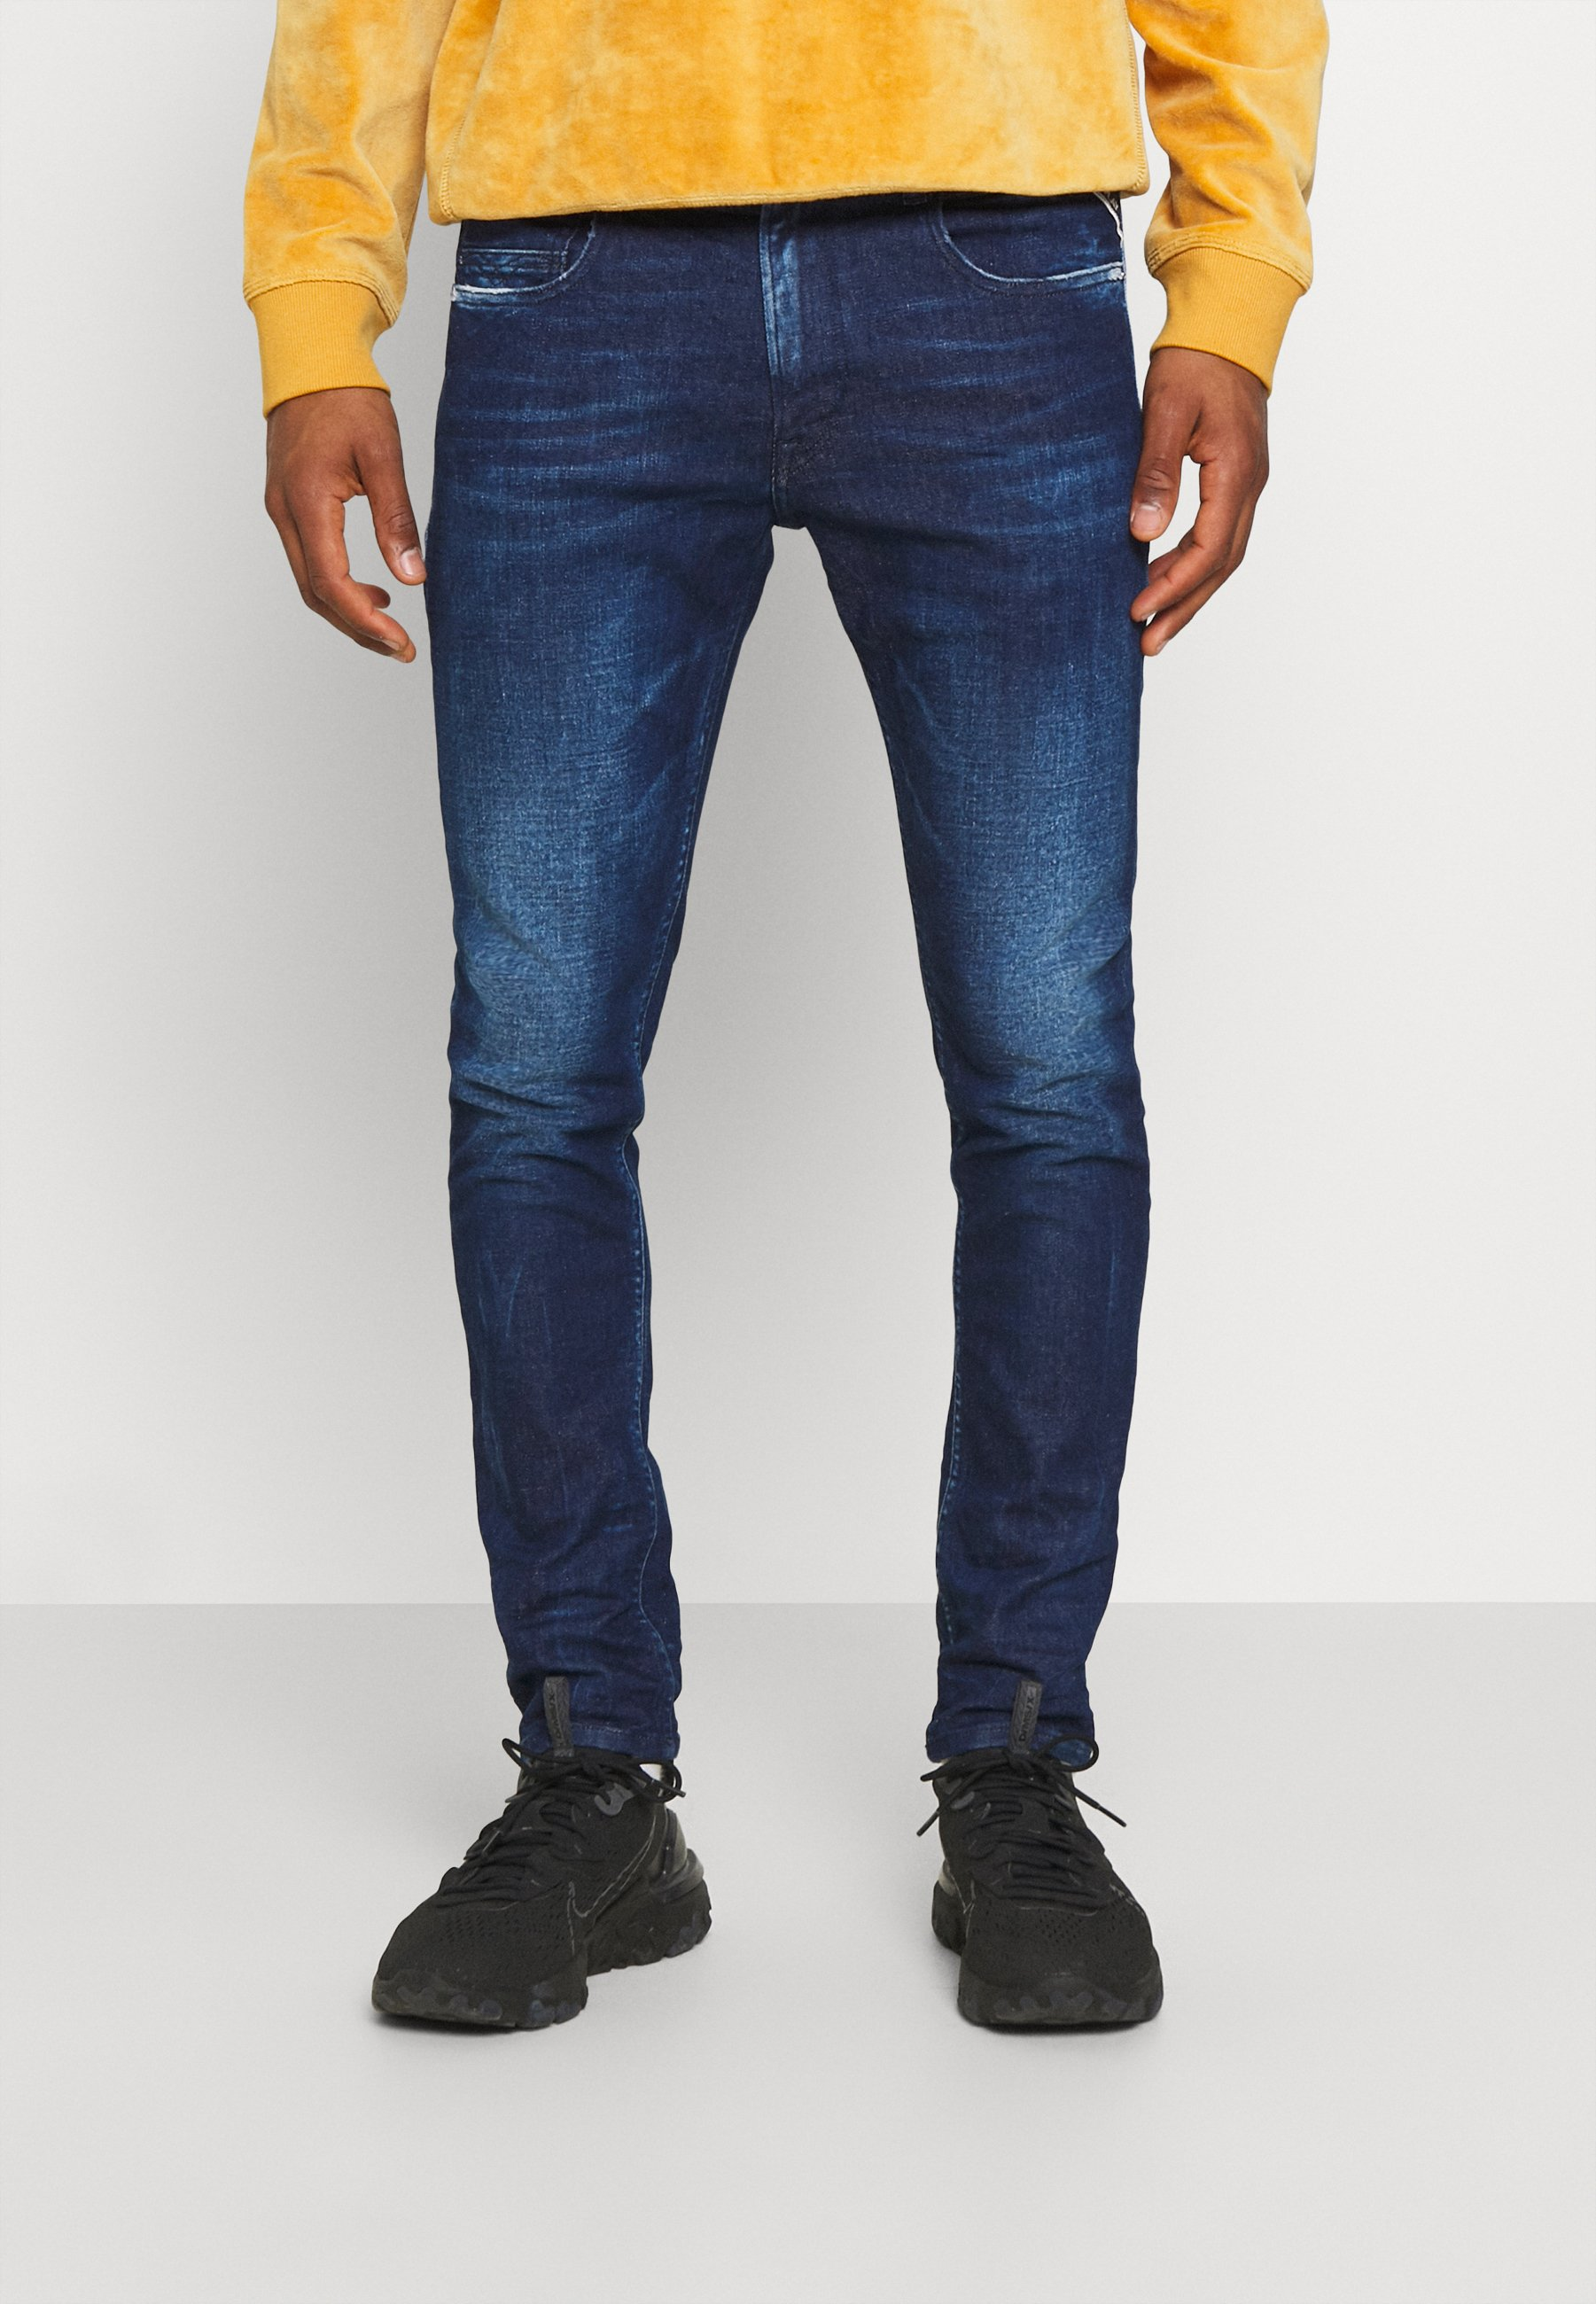 Uomo JOHNFRUS - Jeans slim fit